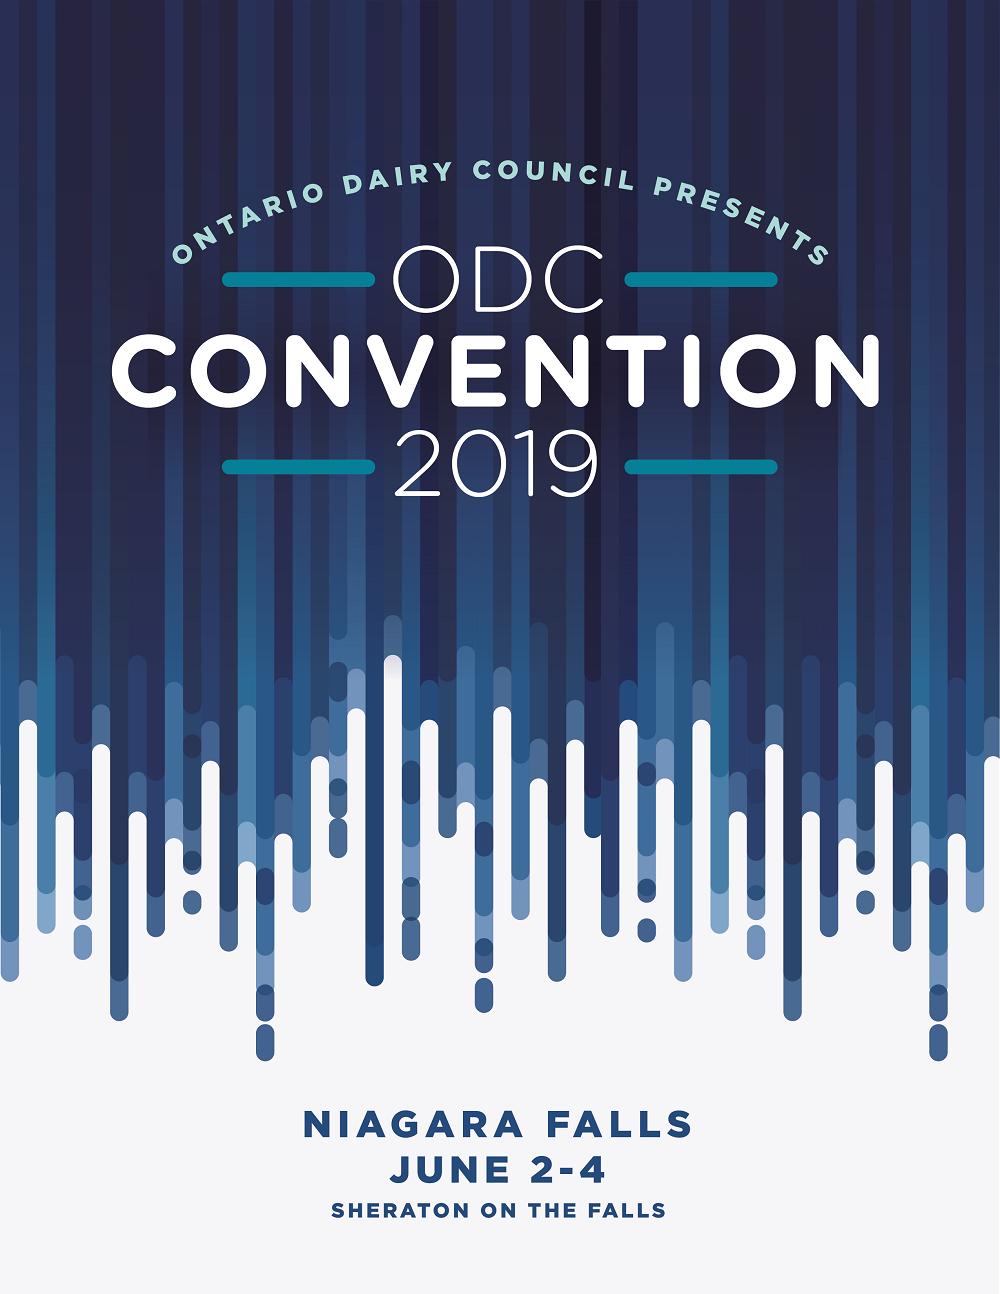 2019 Convention   Ontario Dairy Council